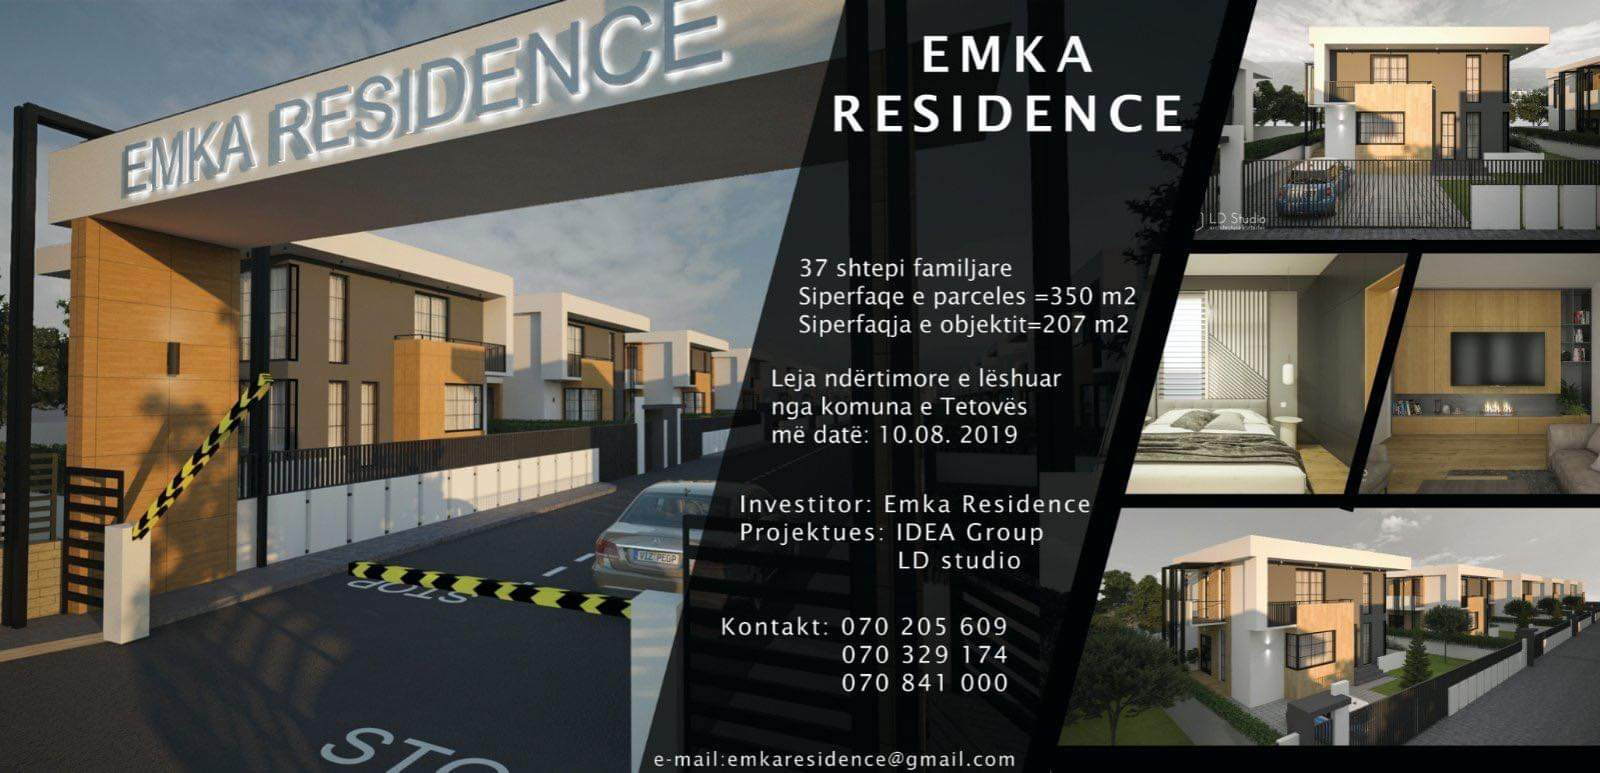 EMKA Residence